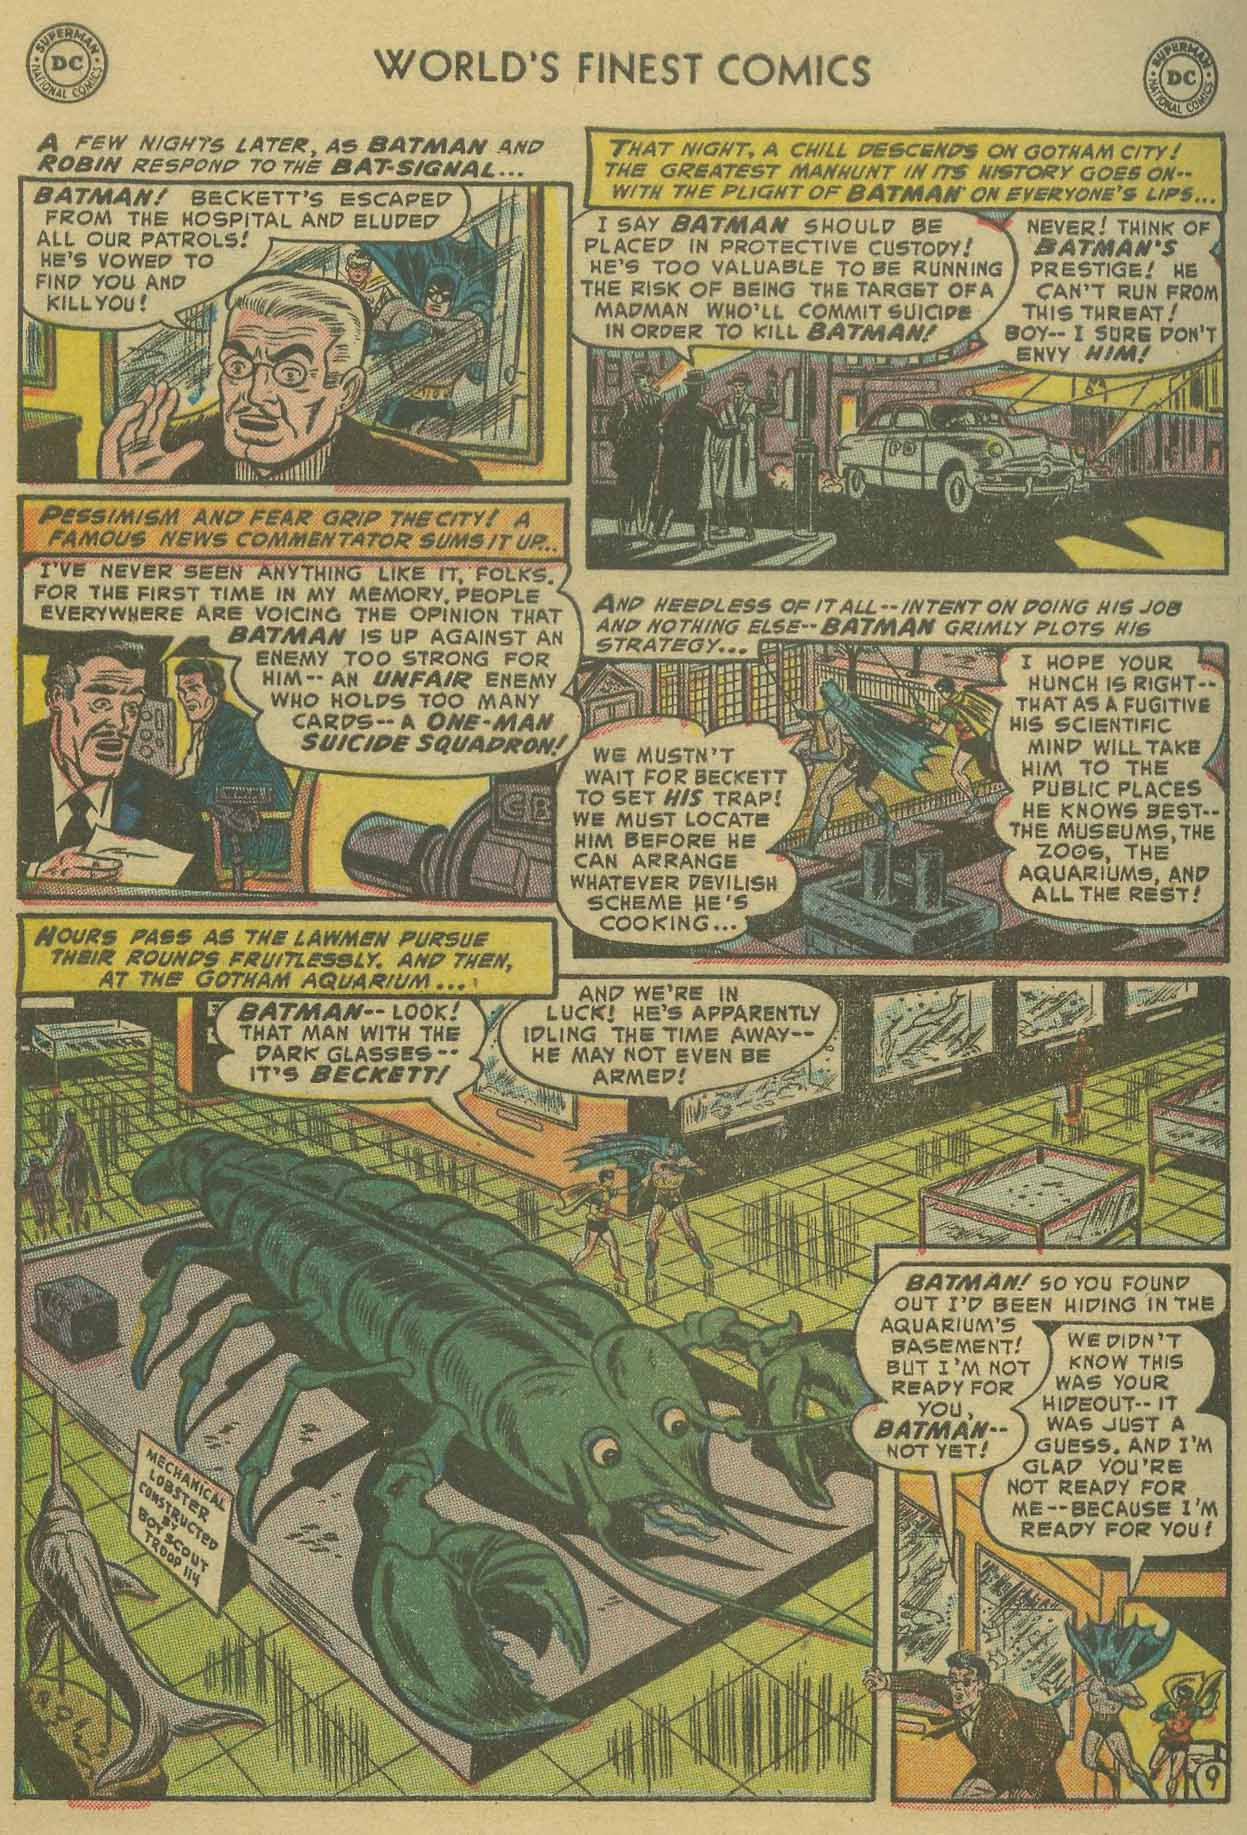 Read online World's Finest Comics comic -  Issue #69 - 62